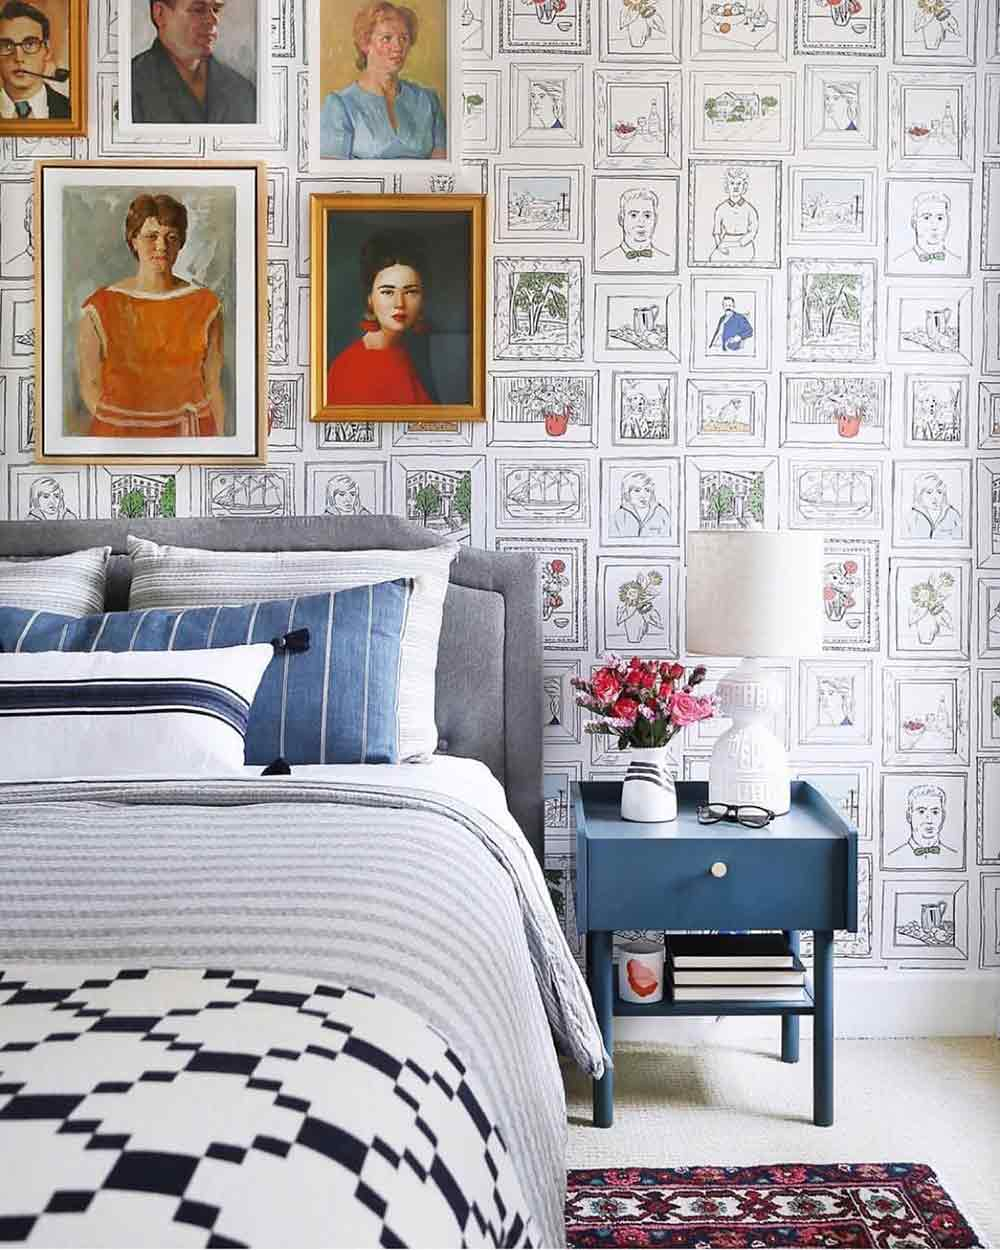 Pilih wallpaper yang paling sesuai dengan kepribadian Anda untuk kamar tidur, via pinterest.com